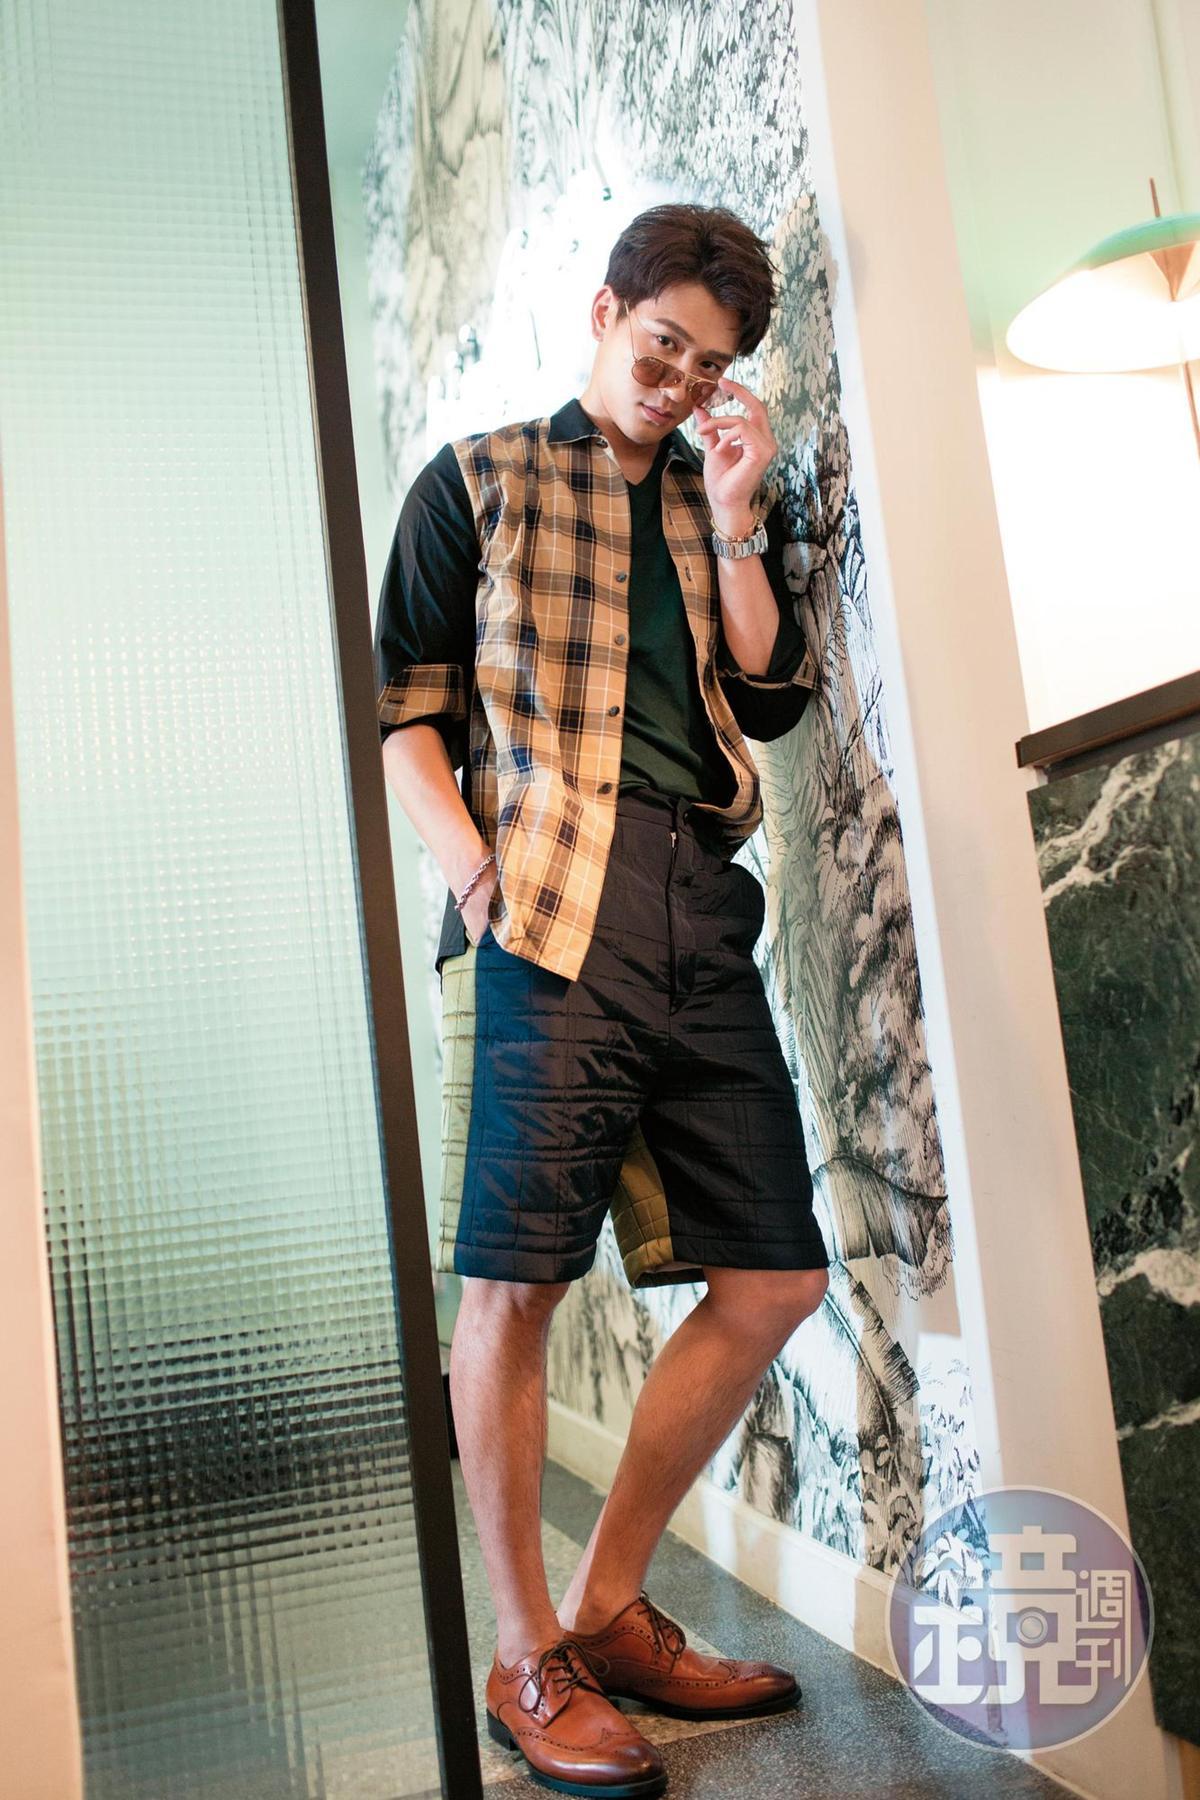 Banana Republic內搭T-Shirt。約NT$1,000 Jolin Wu/林果設計格子襯衫。NT$9,500/Jolin Wu林果設計短褲。NT$9,900/ALDO牛津鞋。約NT$3,500